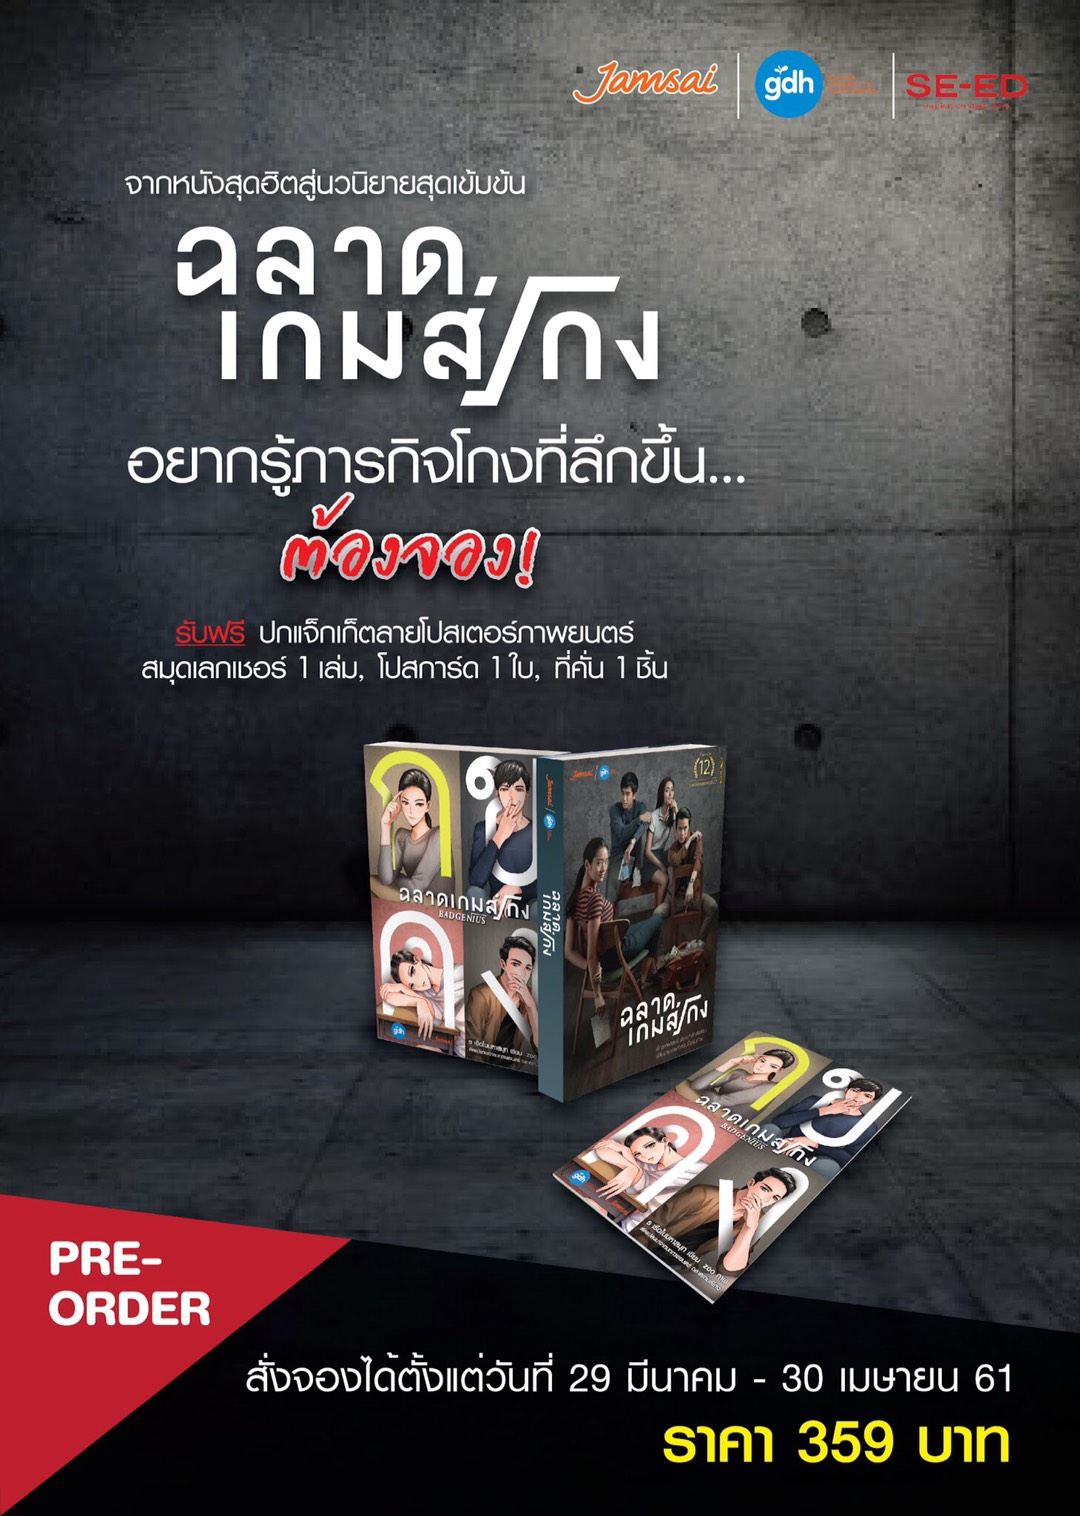 Jamsai x GDH แถลงข่าวเปิดตัว Film to Book ครั้งแรกของประเทศไทย ประเดิมด้วย หนังสือฉลาดเกมส์โกง